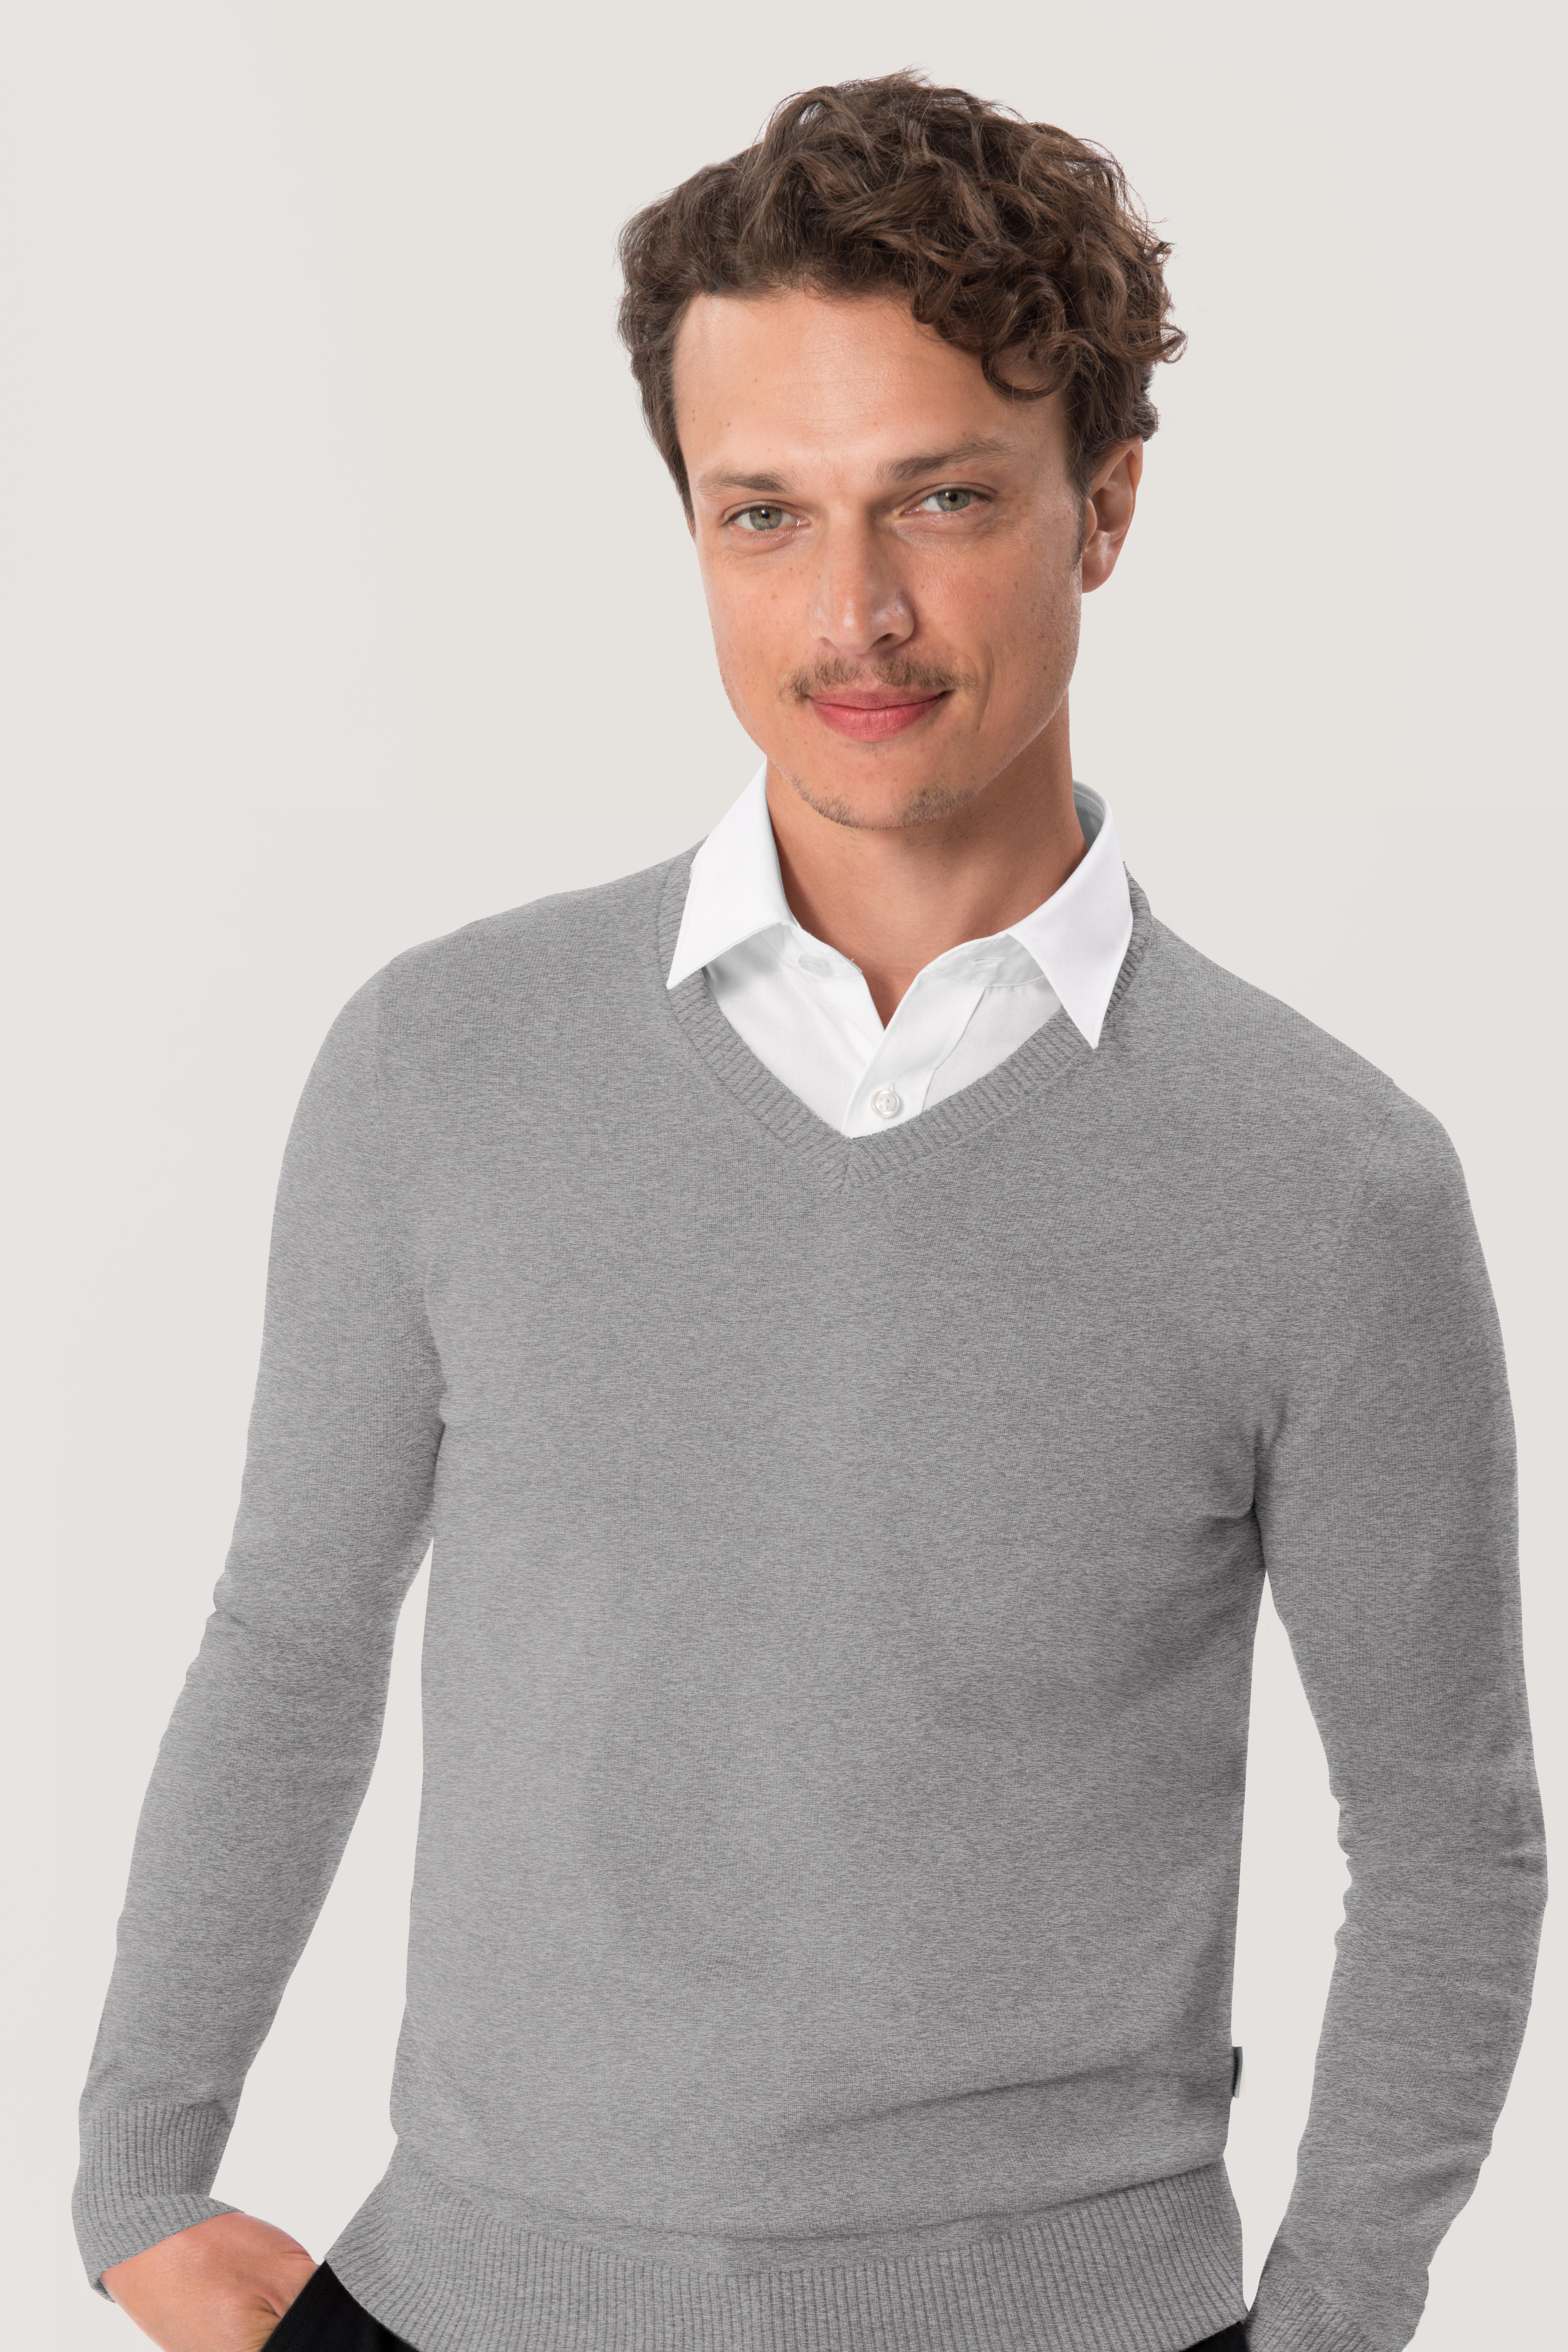 V-Pullover Premium Cotton von Hakro No. 143